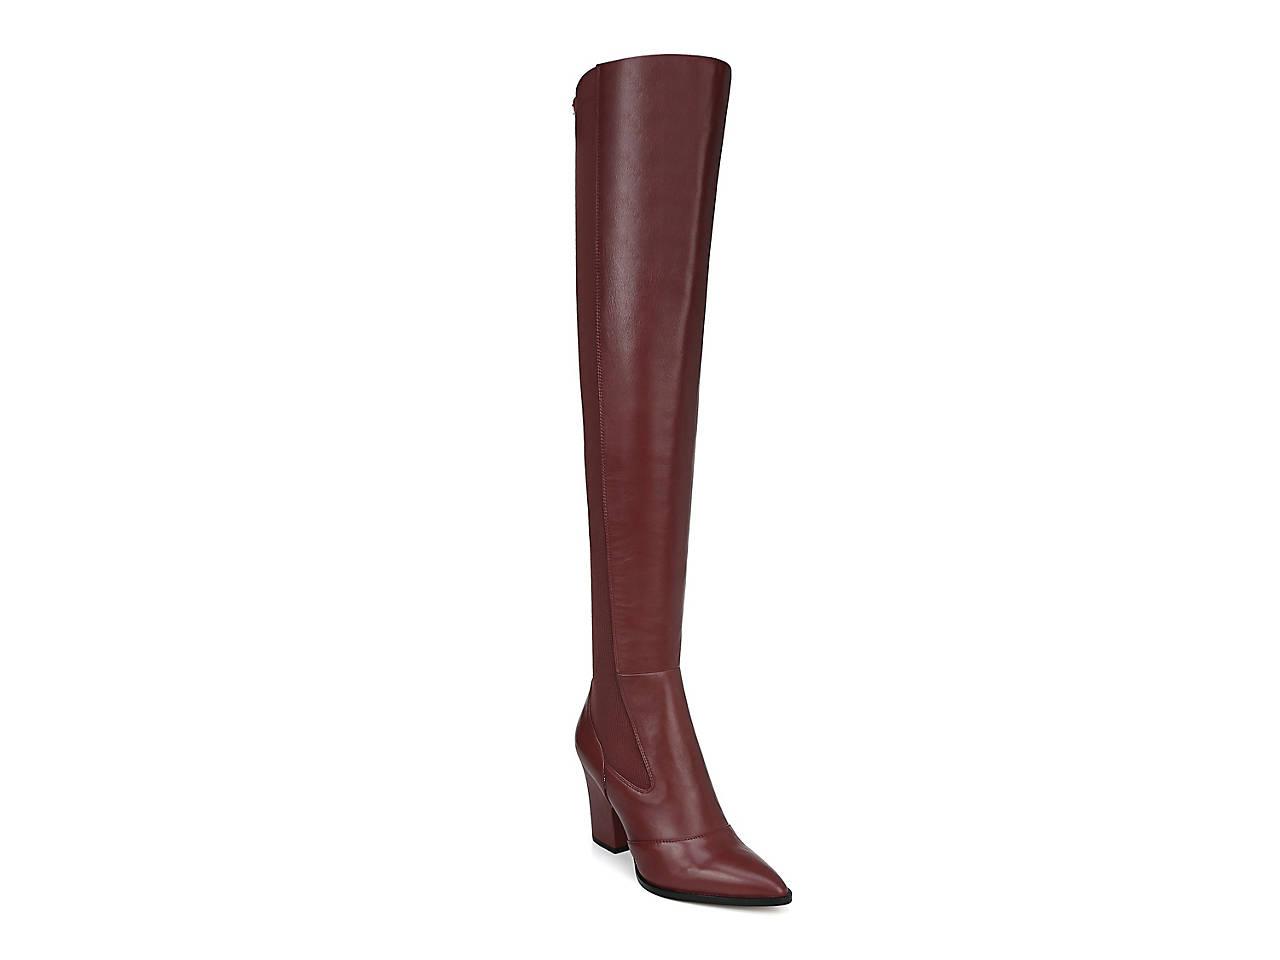 36c19e857144 Sam Edelman Natasha Over The Knee Boot Women s Shoes